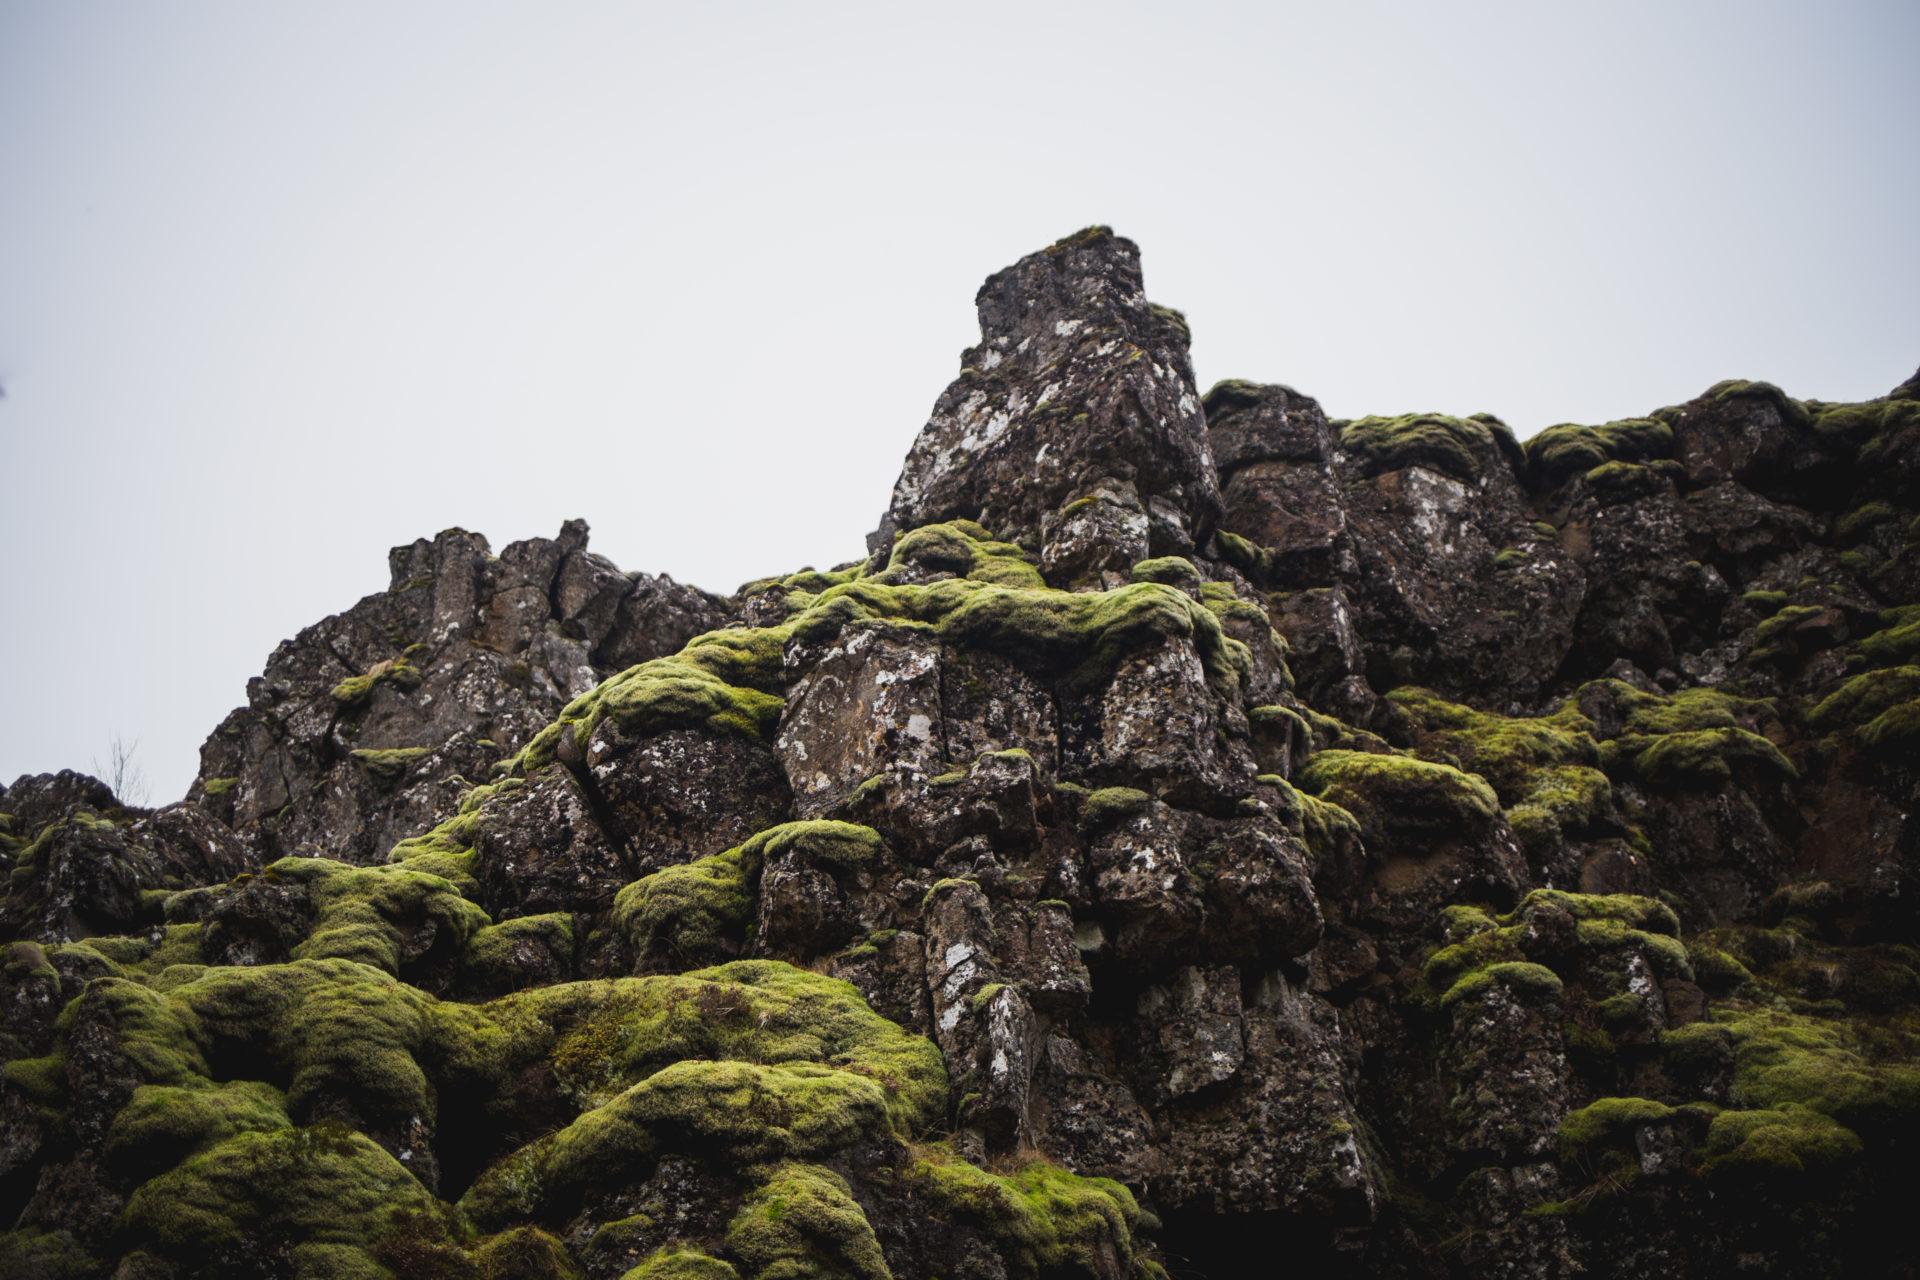 Island_Iceland_IMG_0188_Carolin-Weinkopf-2